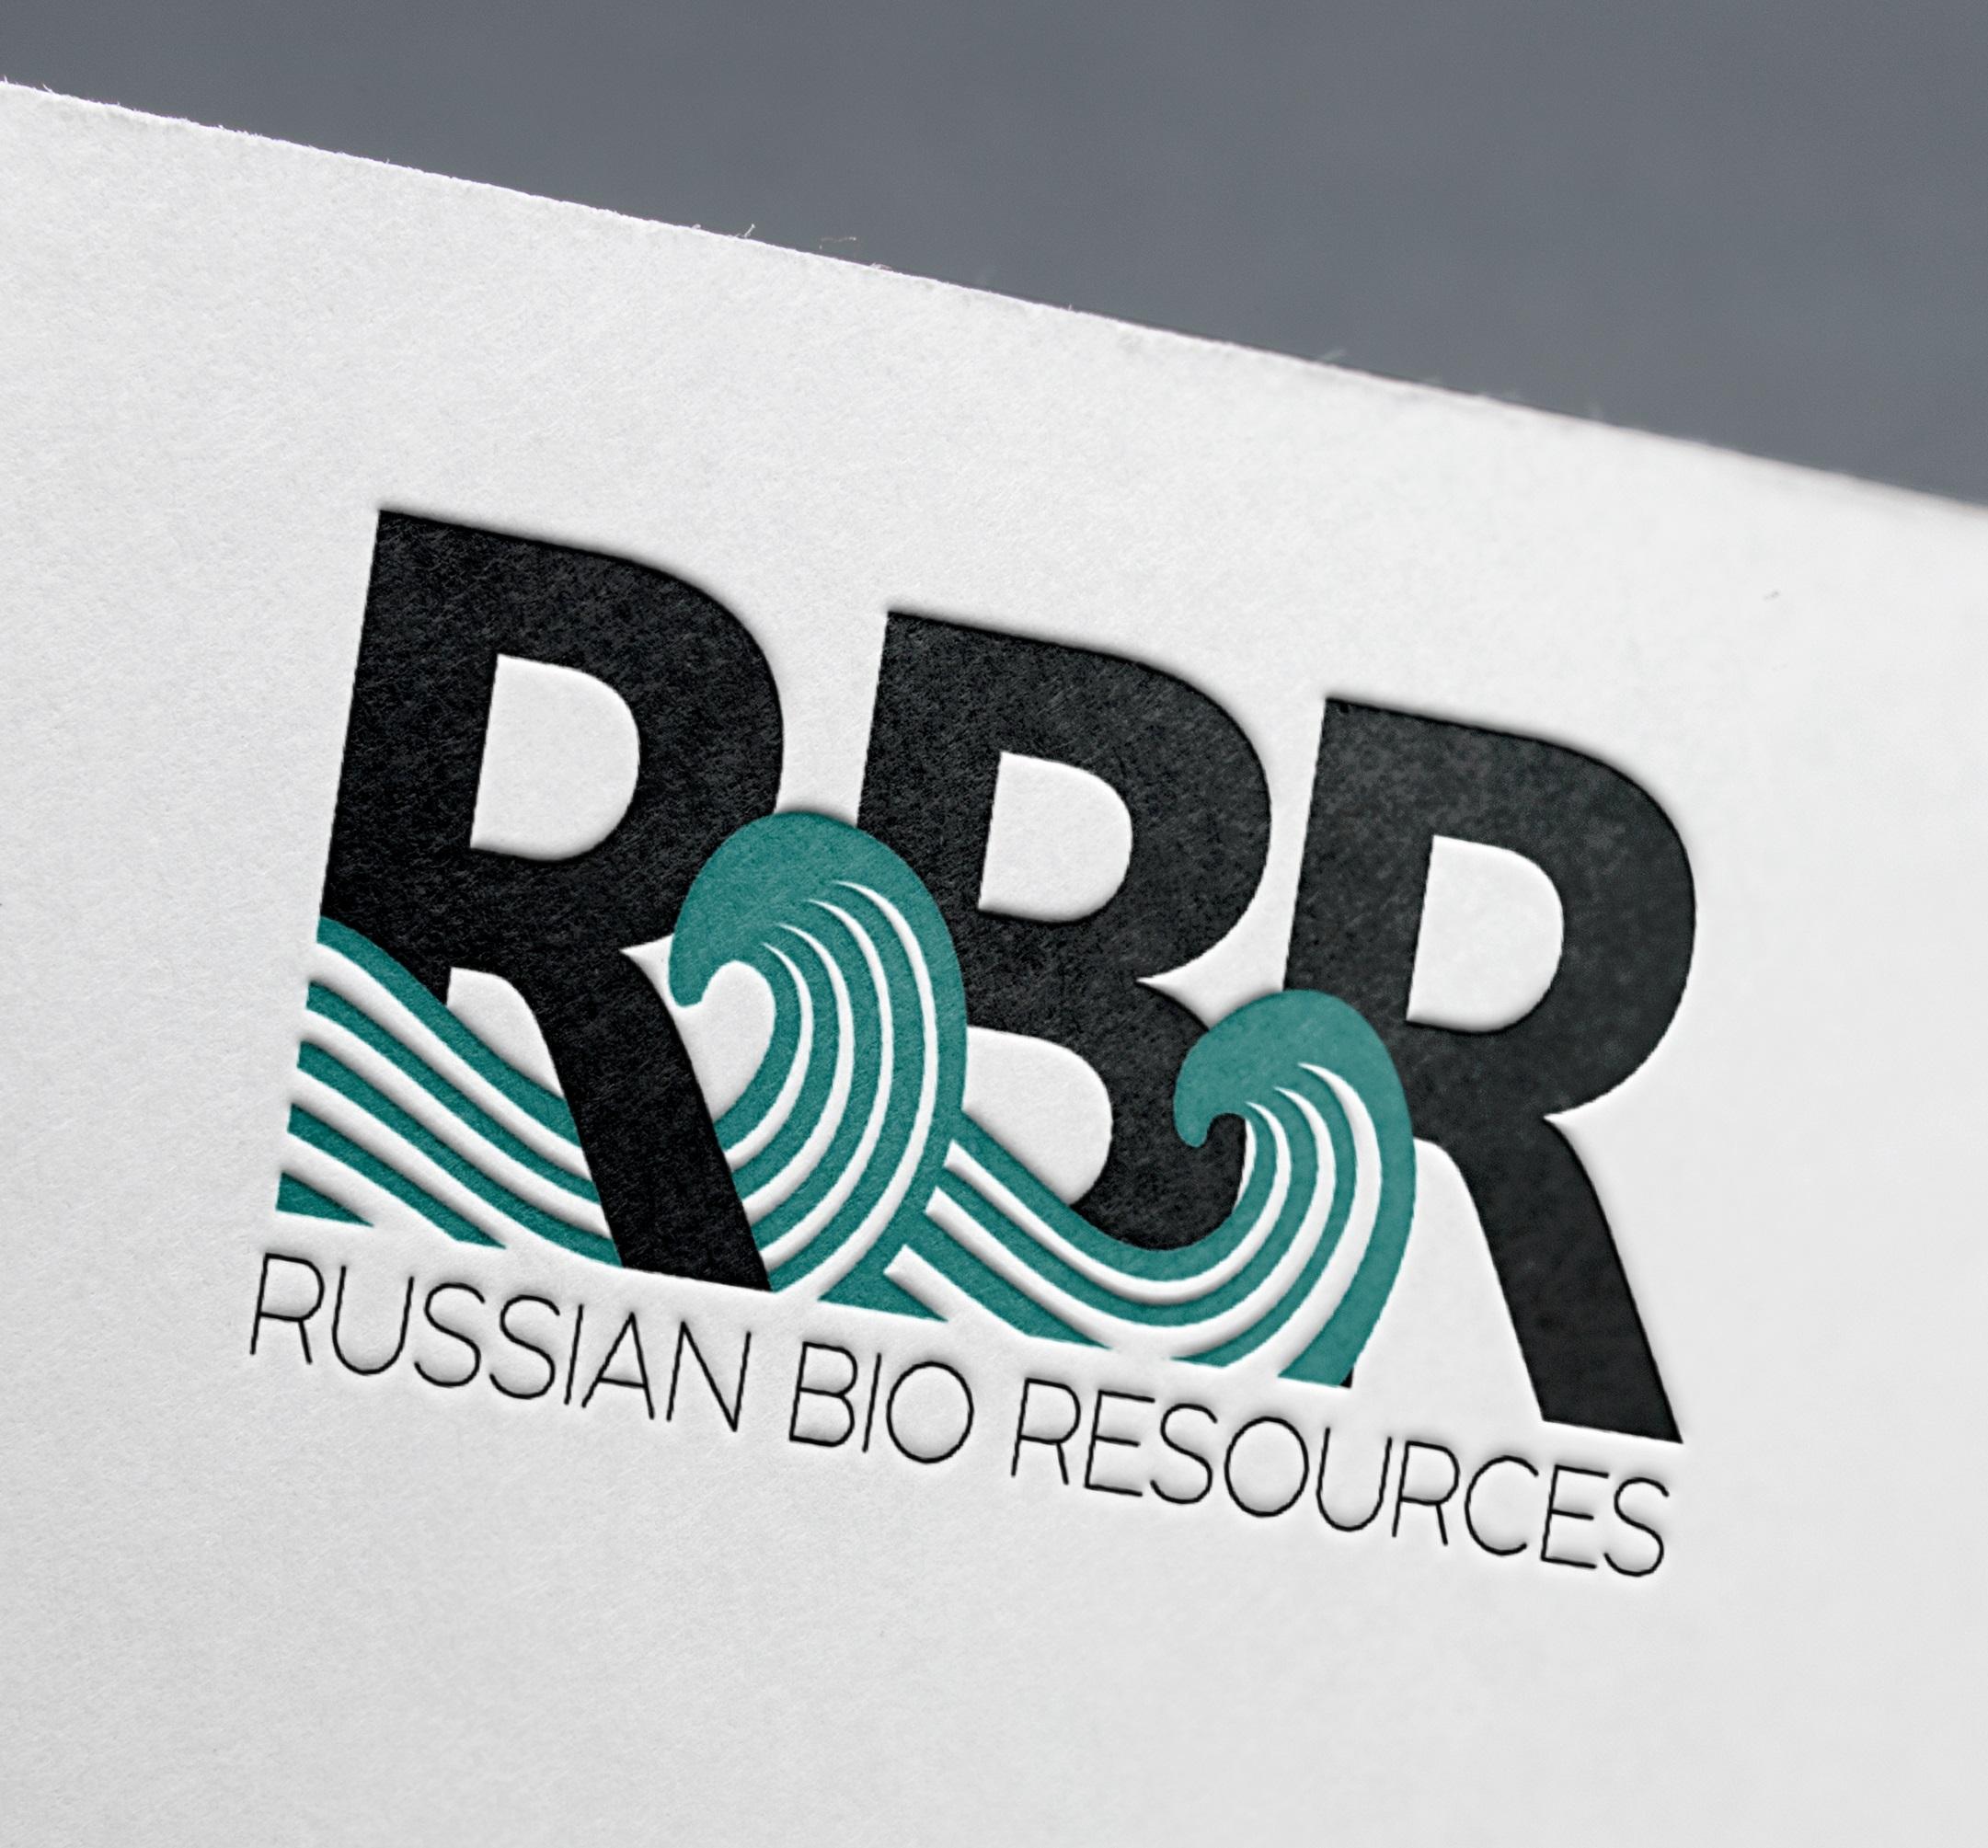 Разработка логотипа для компании «Русские Био Ресурсы» фото f_40258fbfa3b3f649.jpg